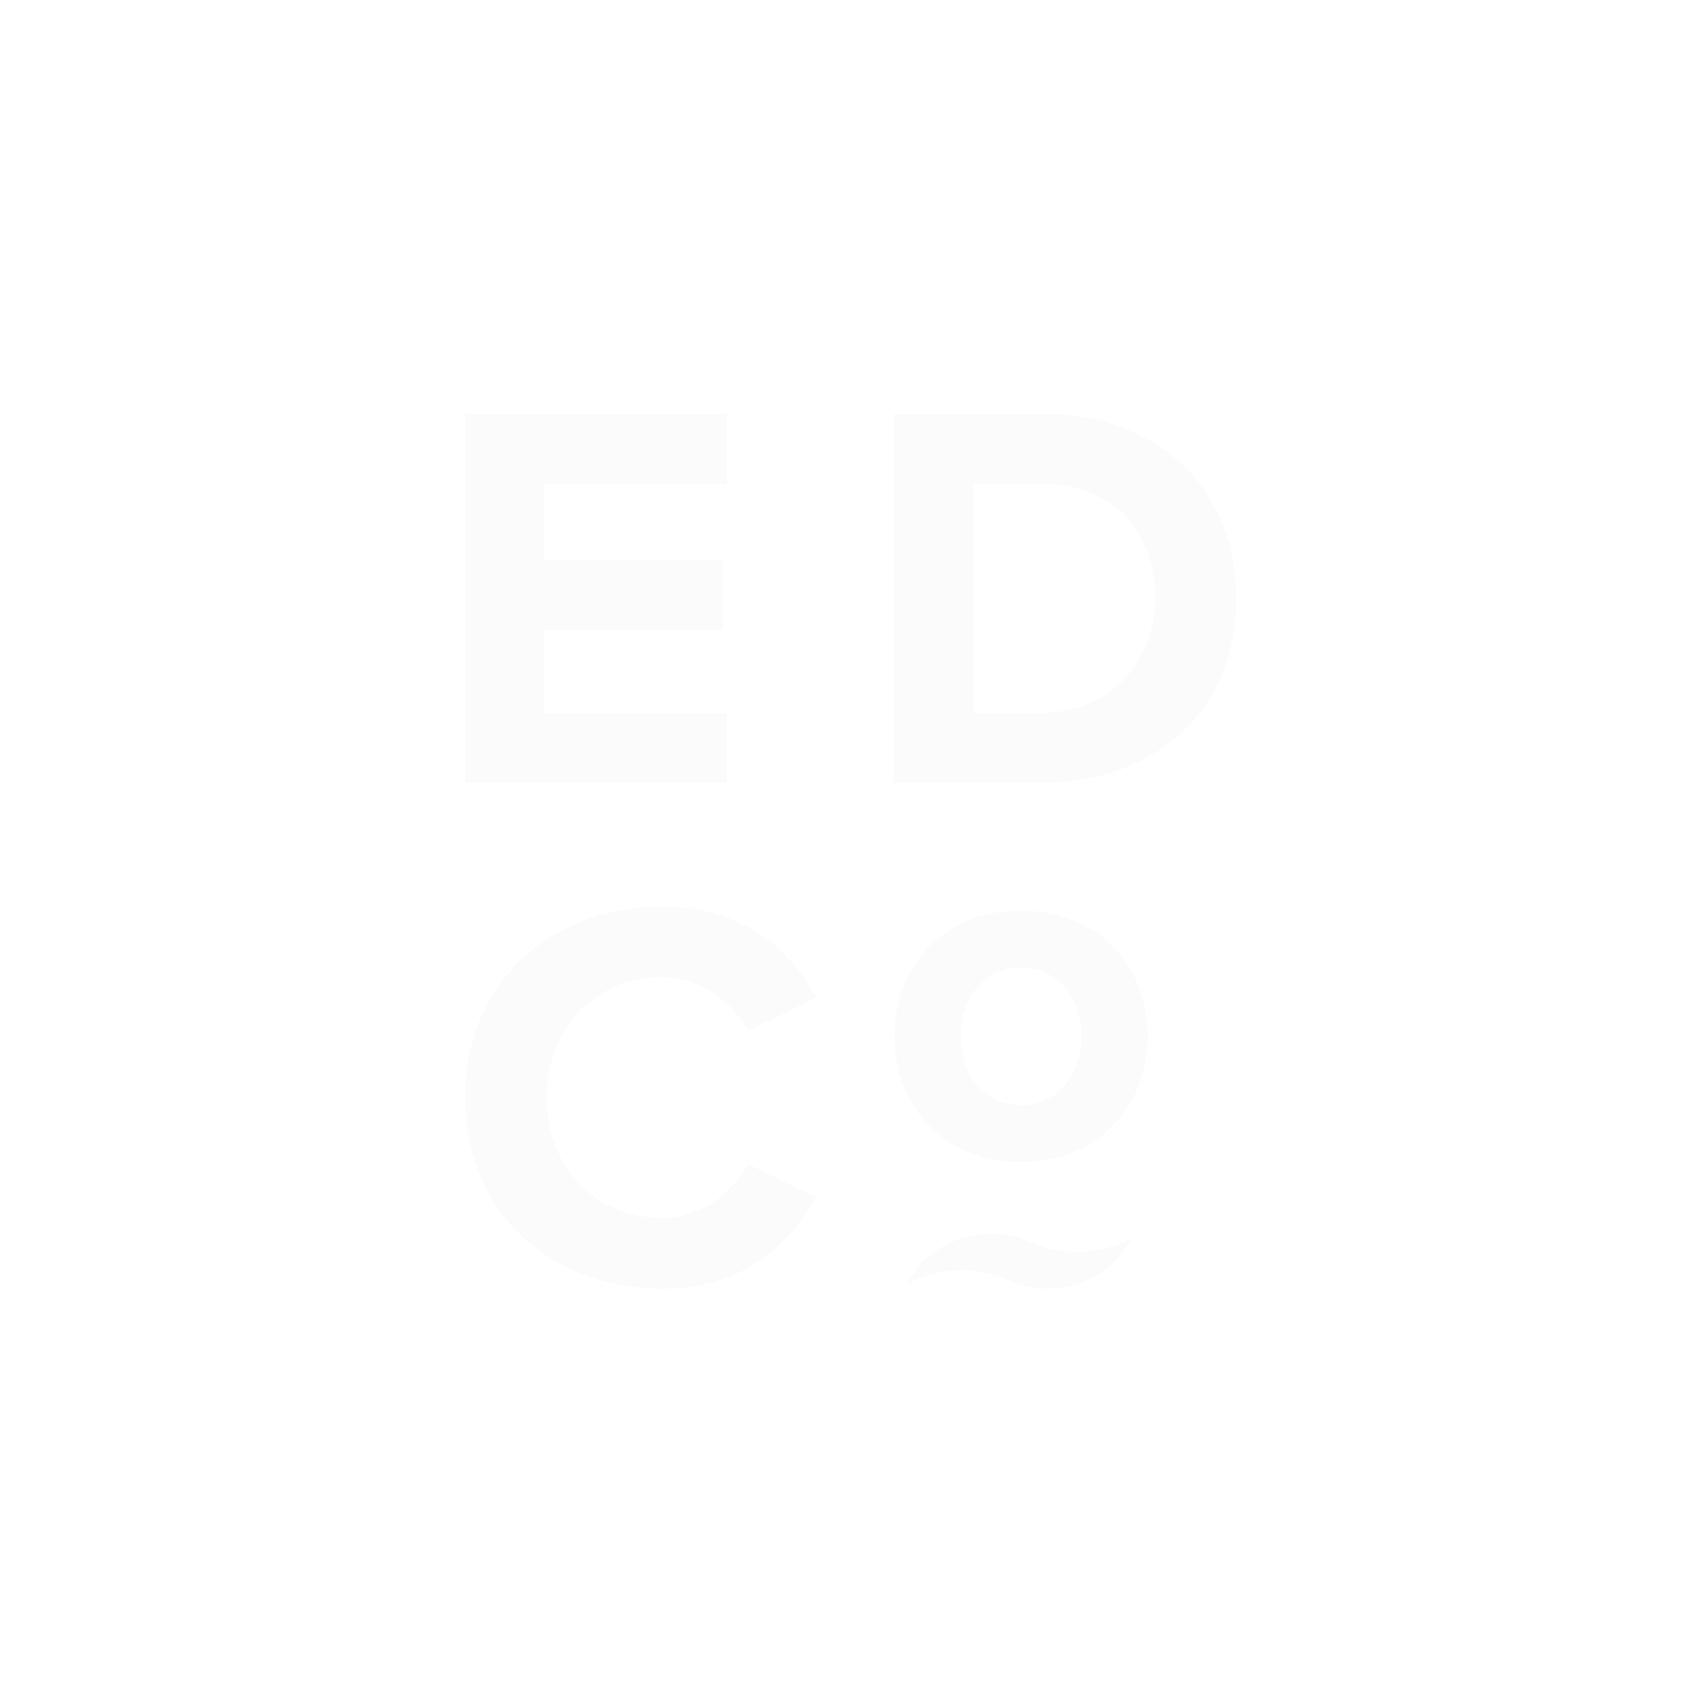 eastmandesignco_brandassets_2019-05.png